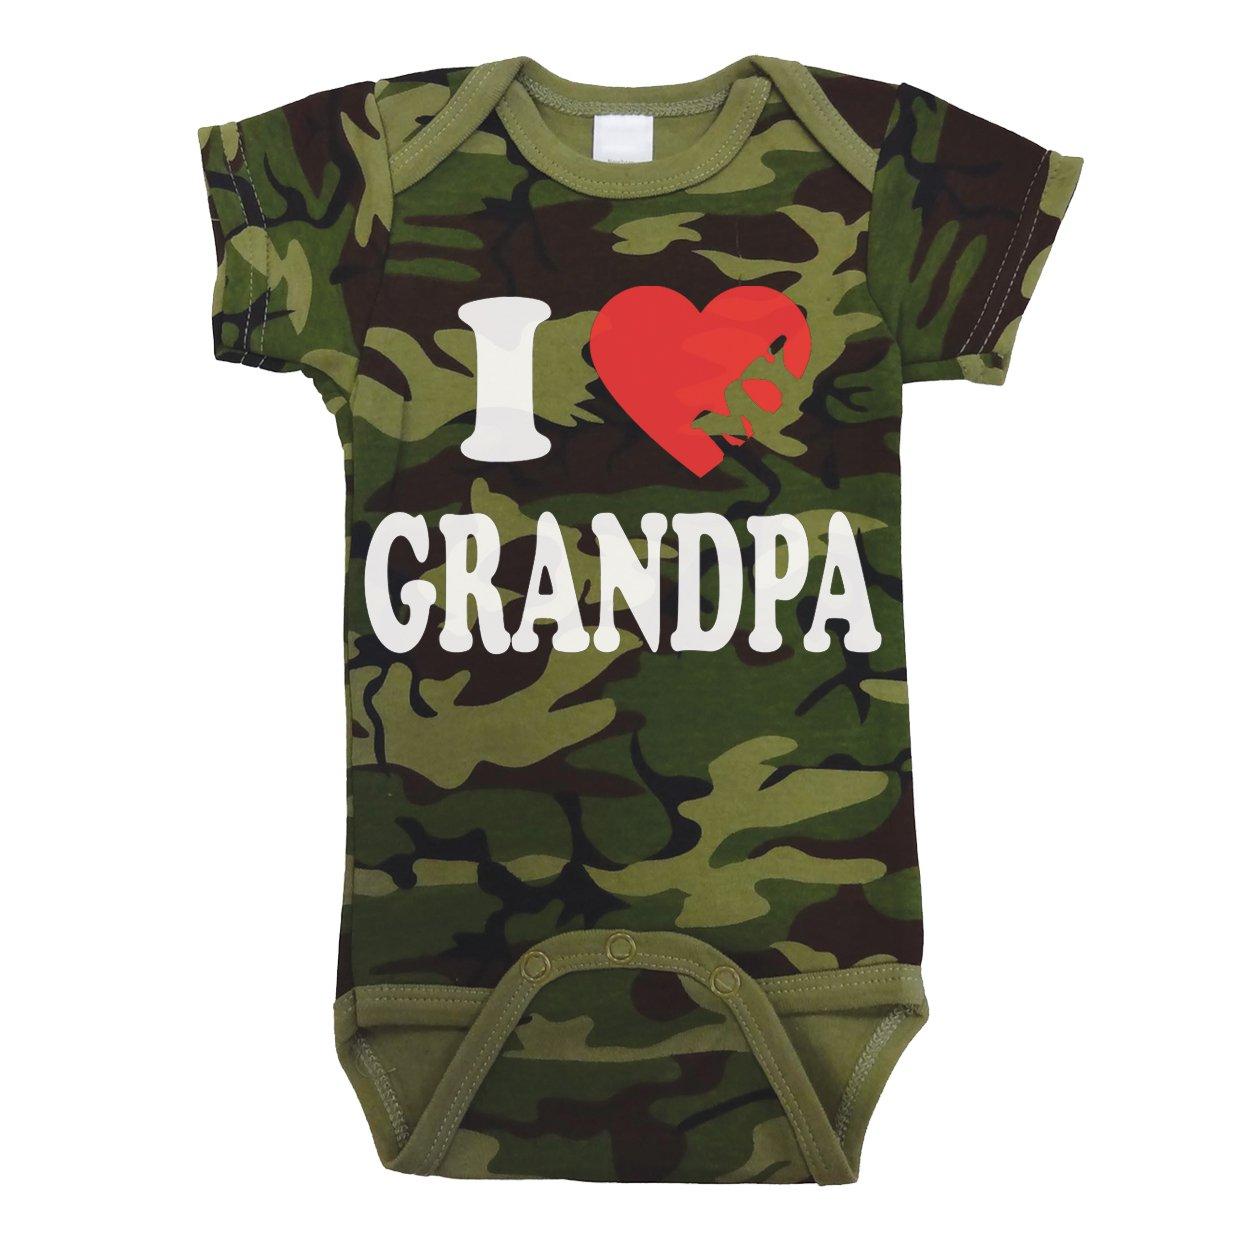 I Love Heart My Grandpa Baby One Piece 18 Months Camo